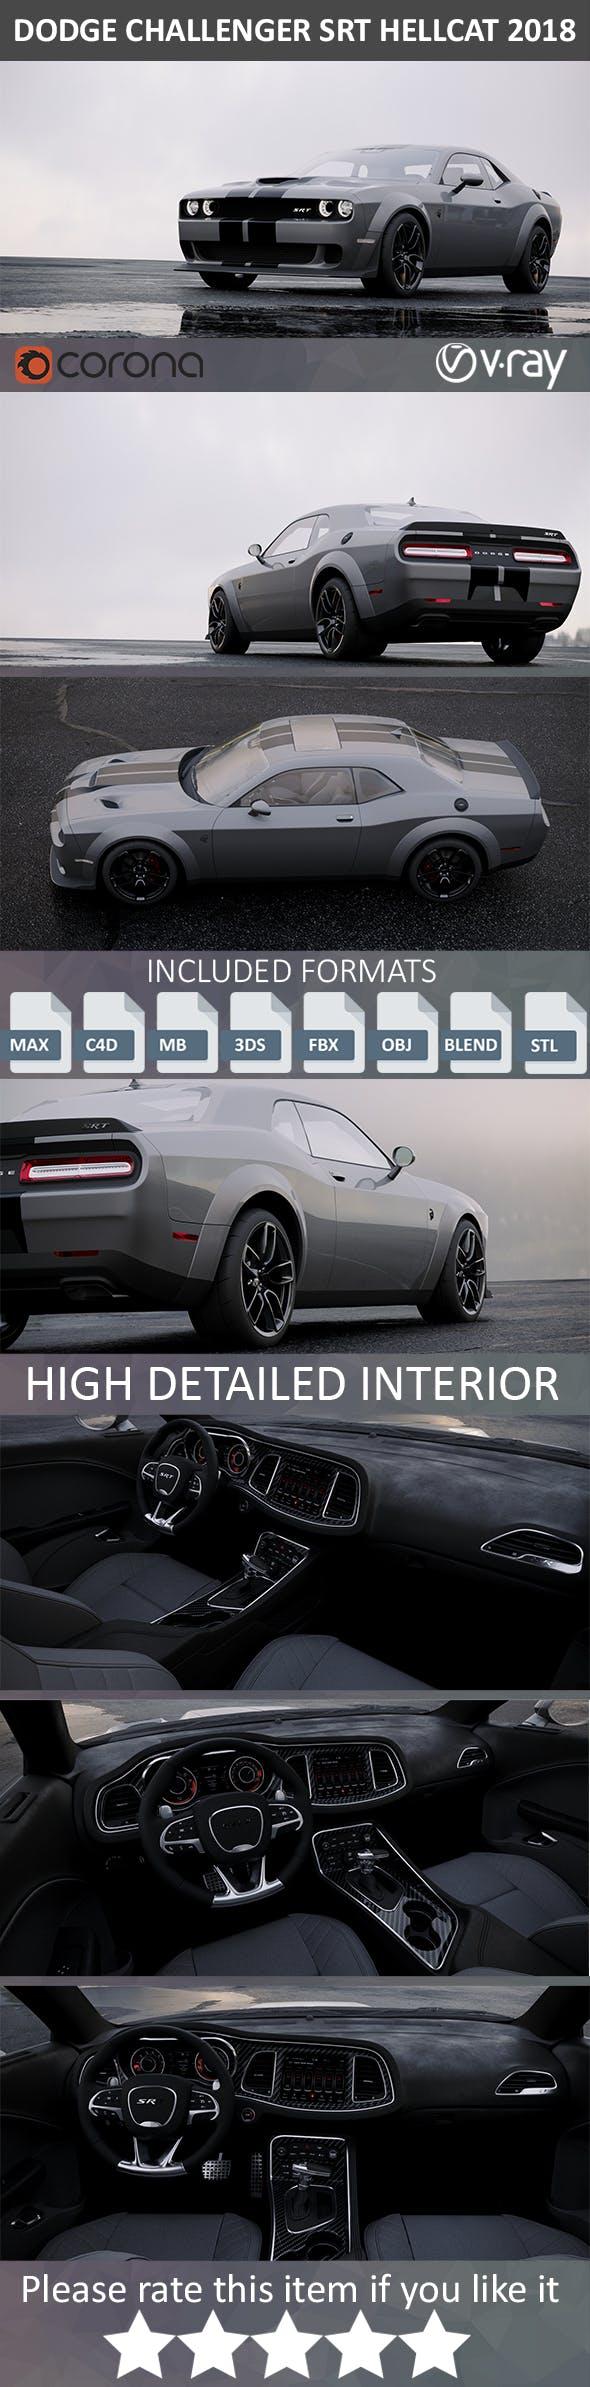 Dodge Challenger SRT Hellcat HD interior 2018 - 3DOcean Item for Sale